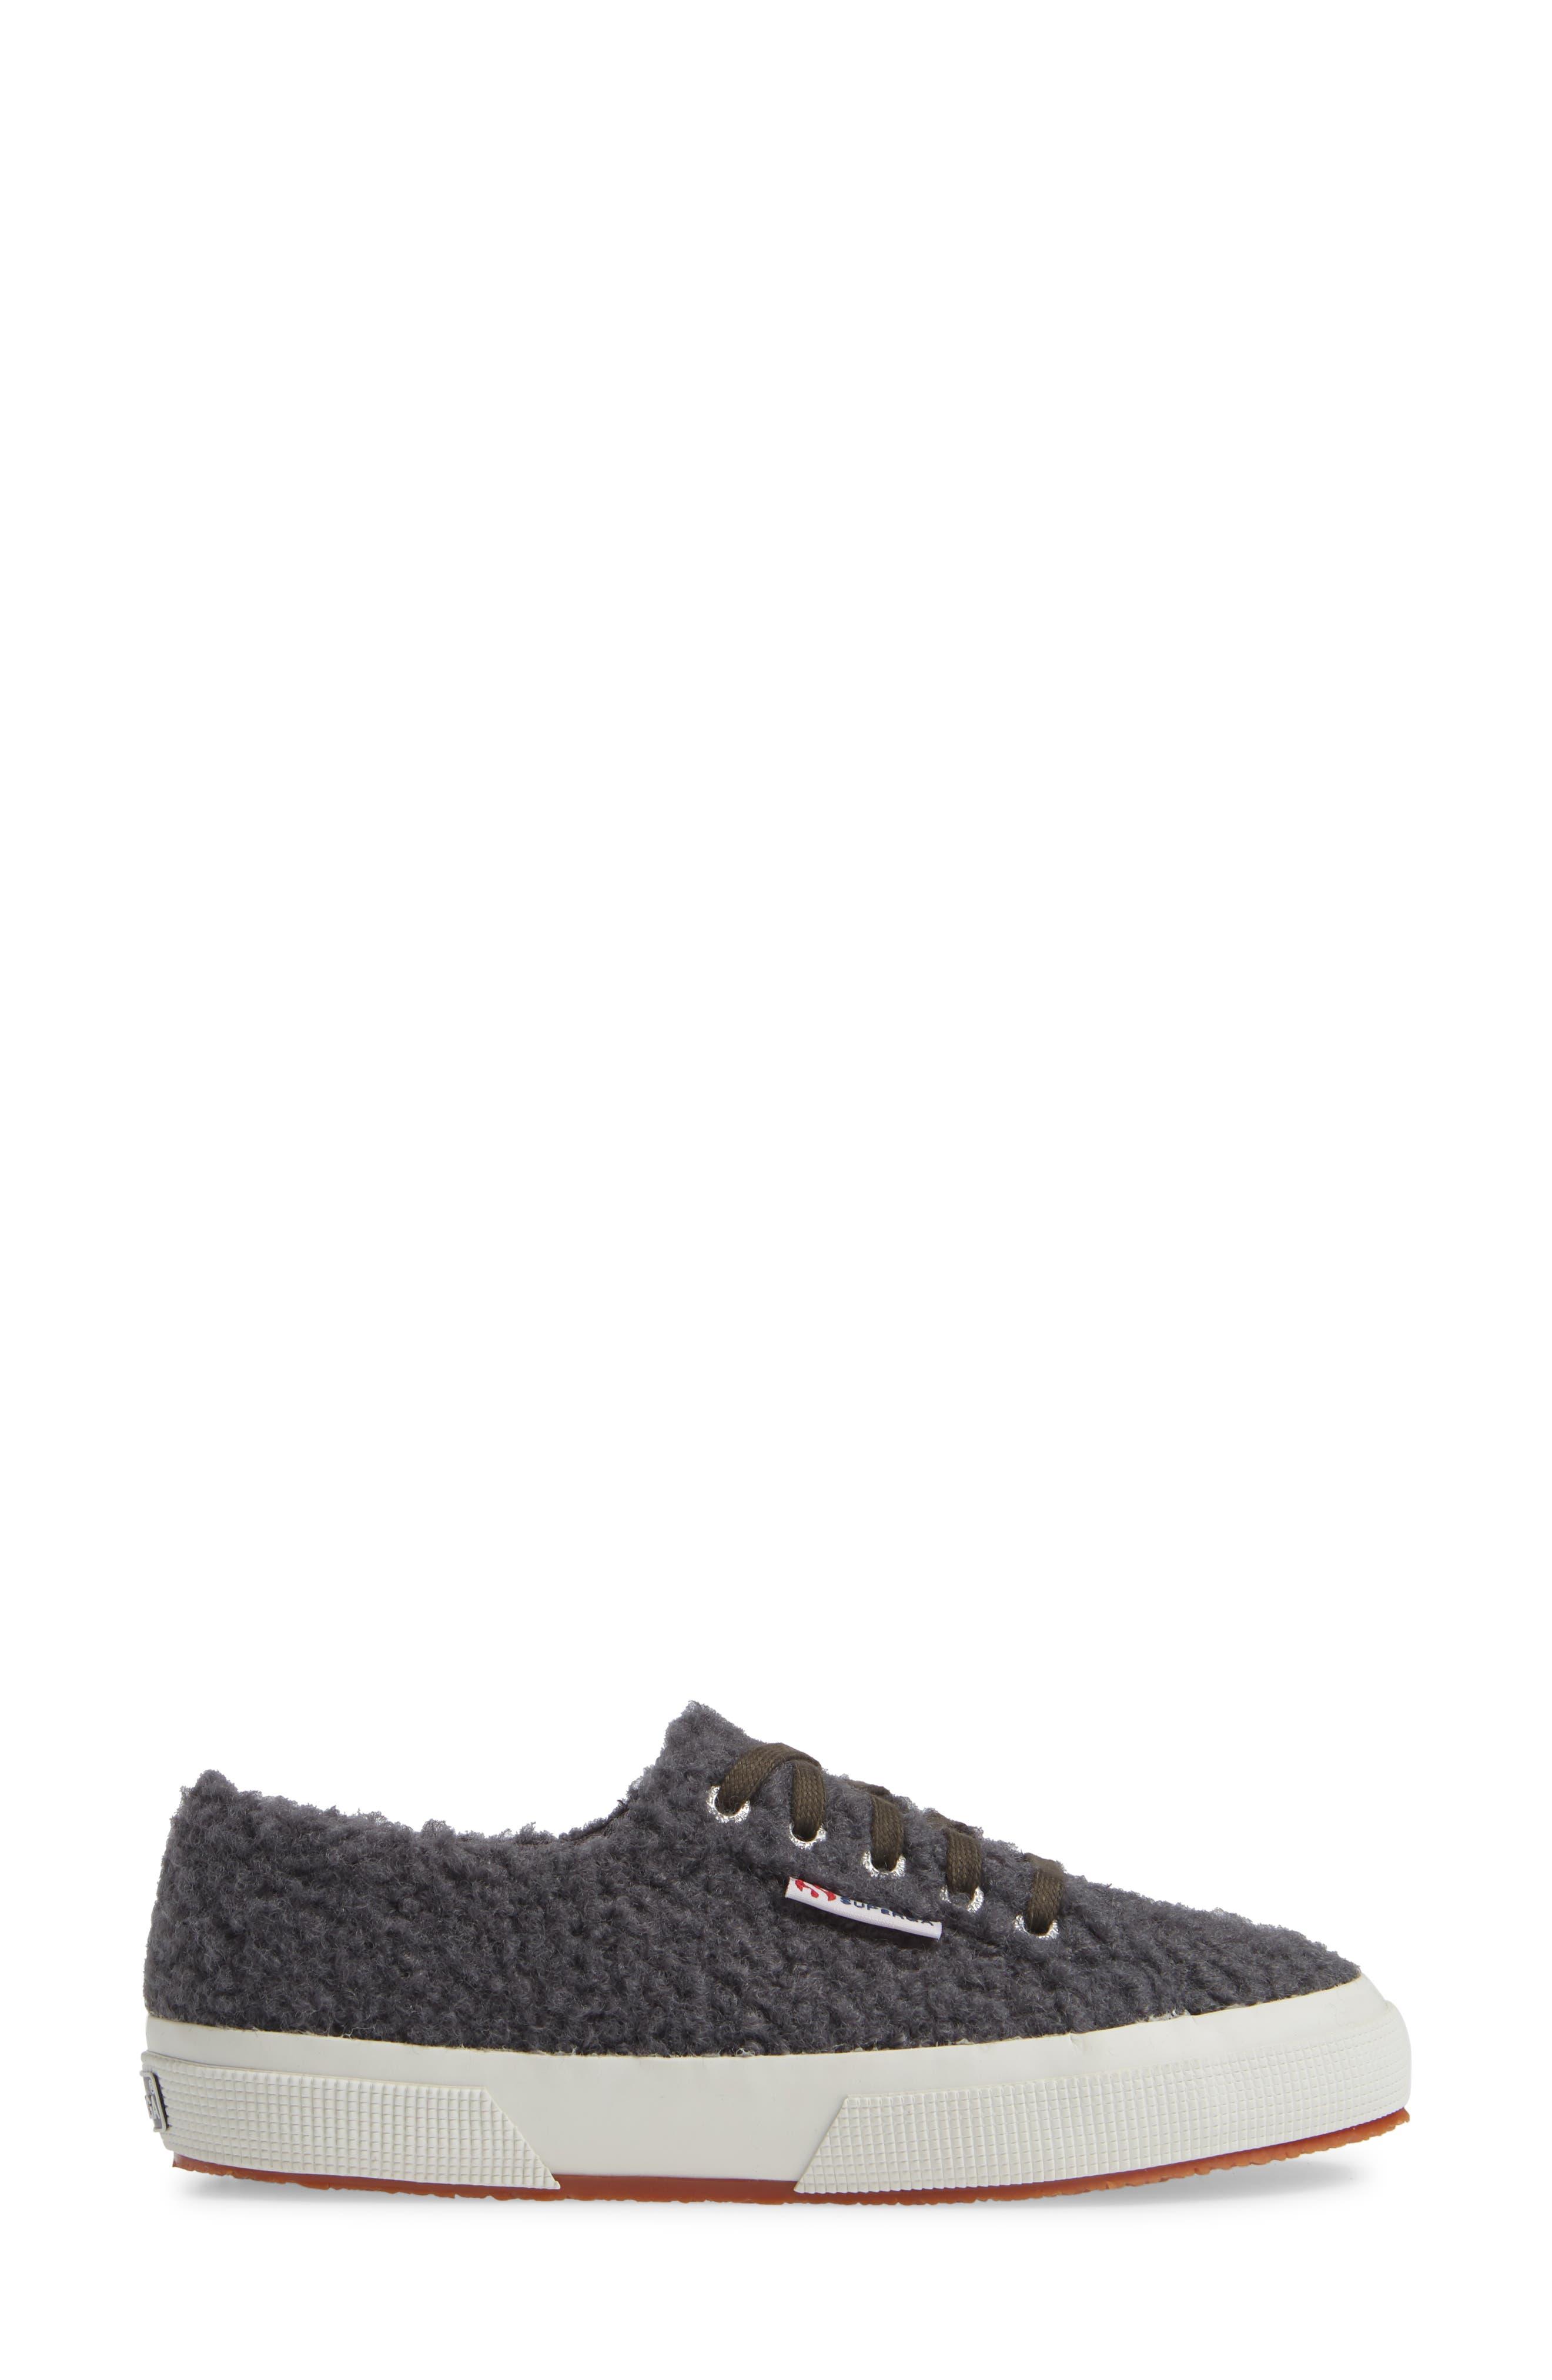 2759 Curly Wool Sneaker,                             Alternate thumbnail 3, color,                             DARK GREY/ GREY